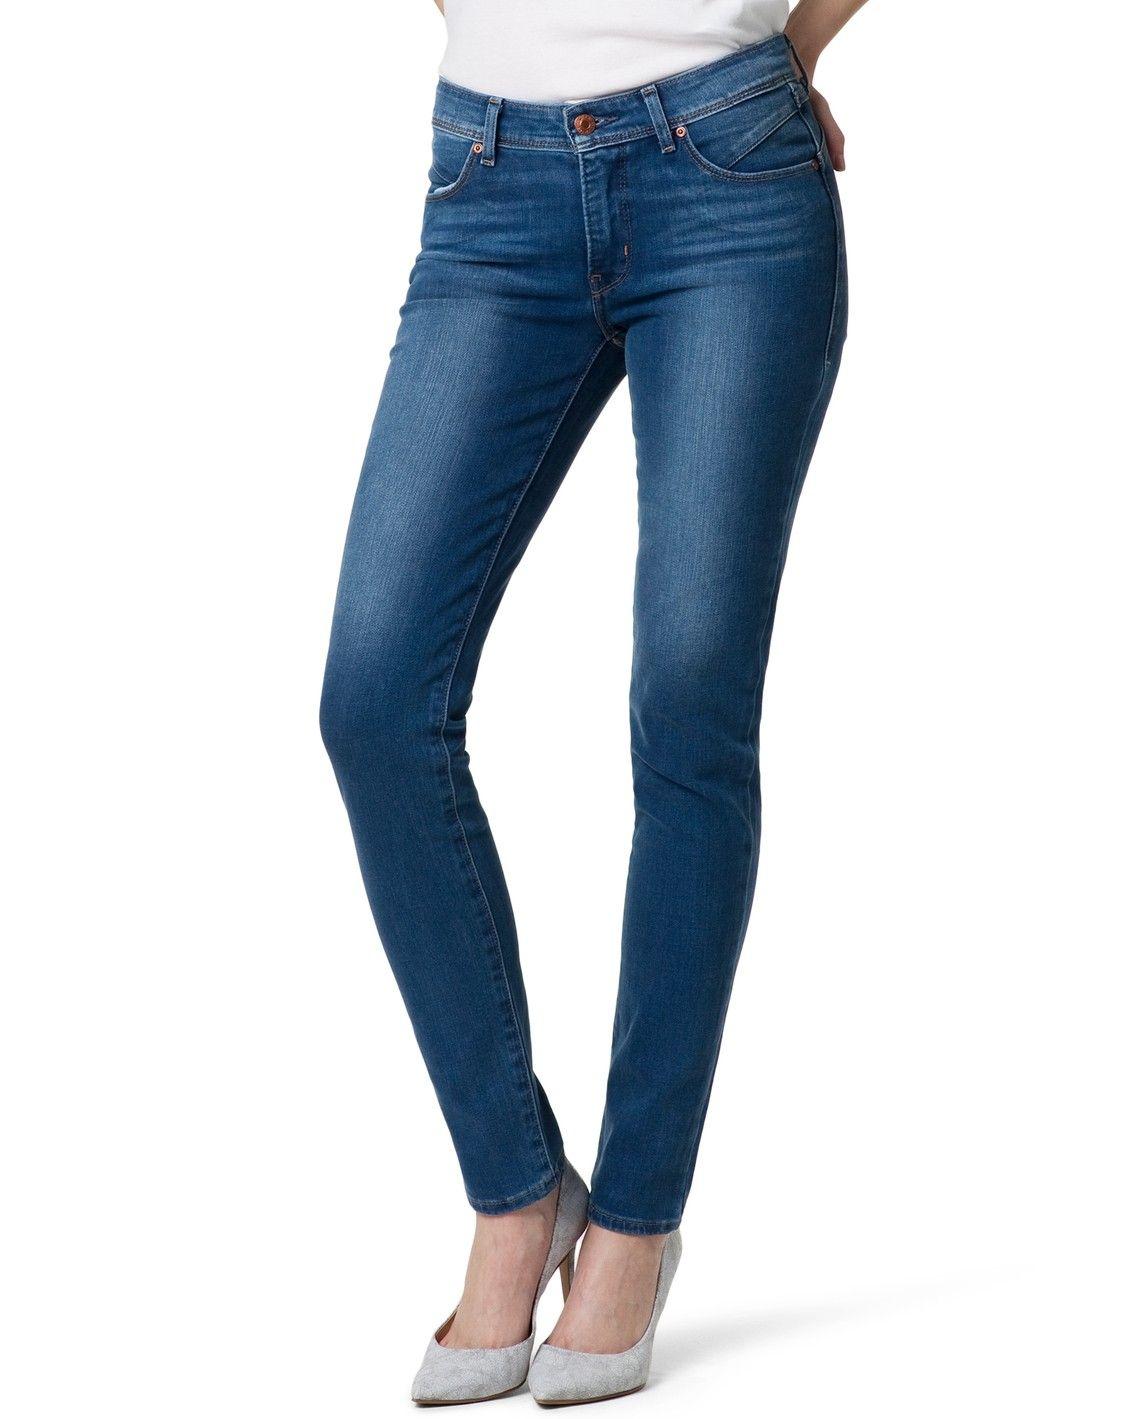 Levi 39 S 20189 Revel Demi Curve Skinny Quot Authentic Sky Quot Spodnie Levi 39 S Damskie Jeans Pl Jeans Sklep On Jeans Online Jeans Skinny Jeans